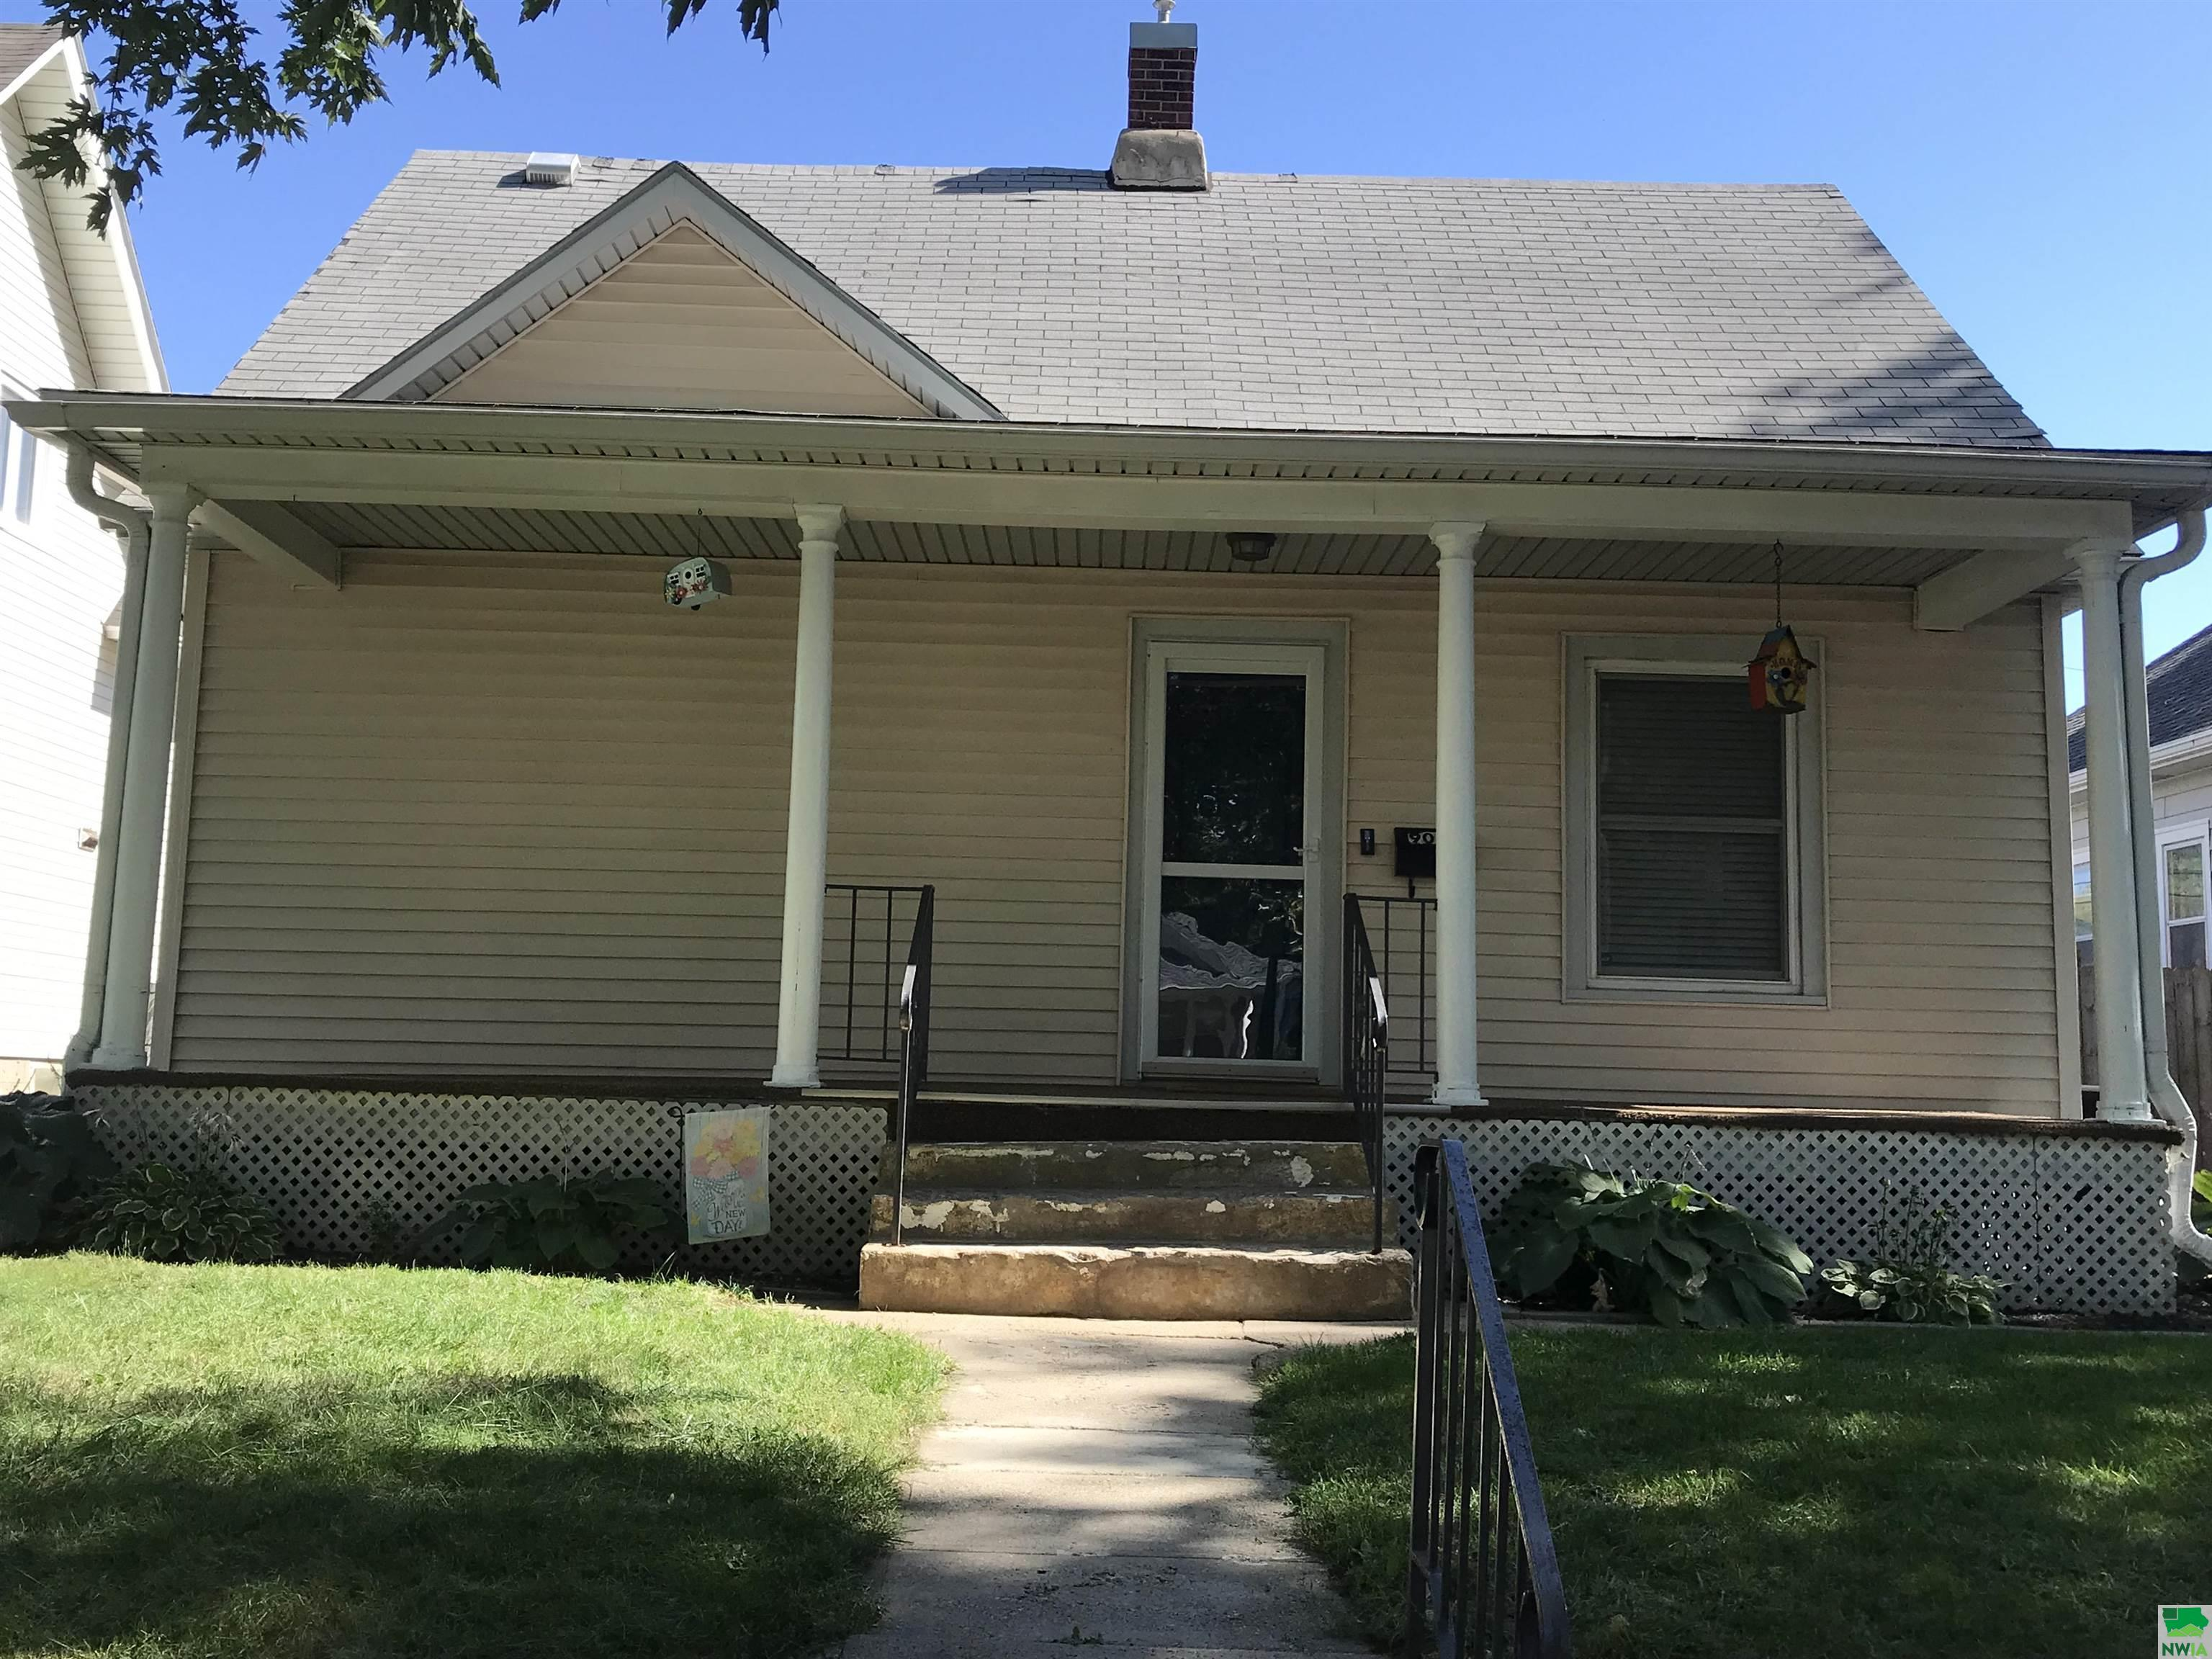 904 Helen street S, Sioux City, Iowa 51106